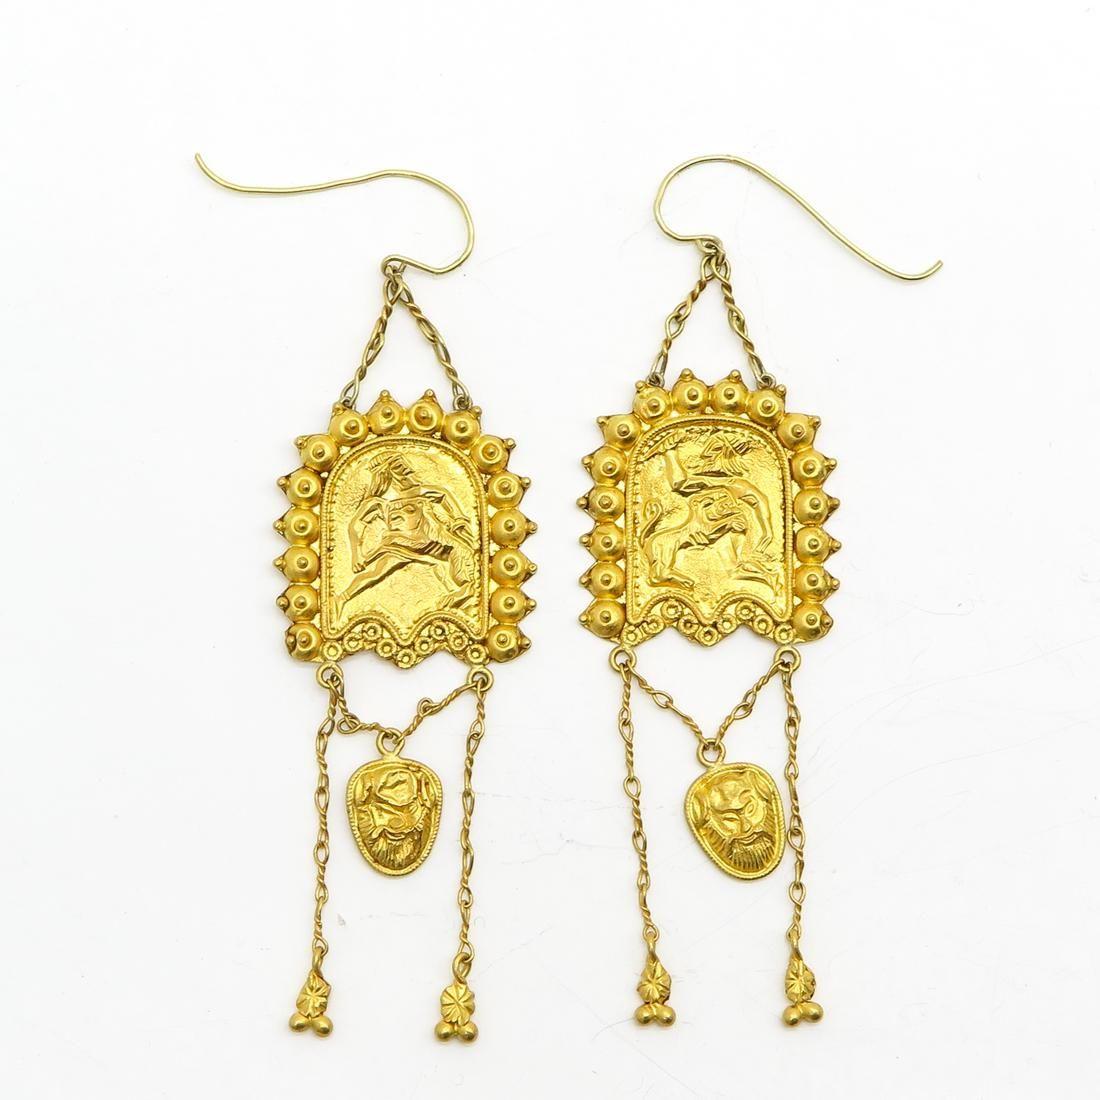 A Beautiful Pair of 18KG Etruscan Earrings